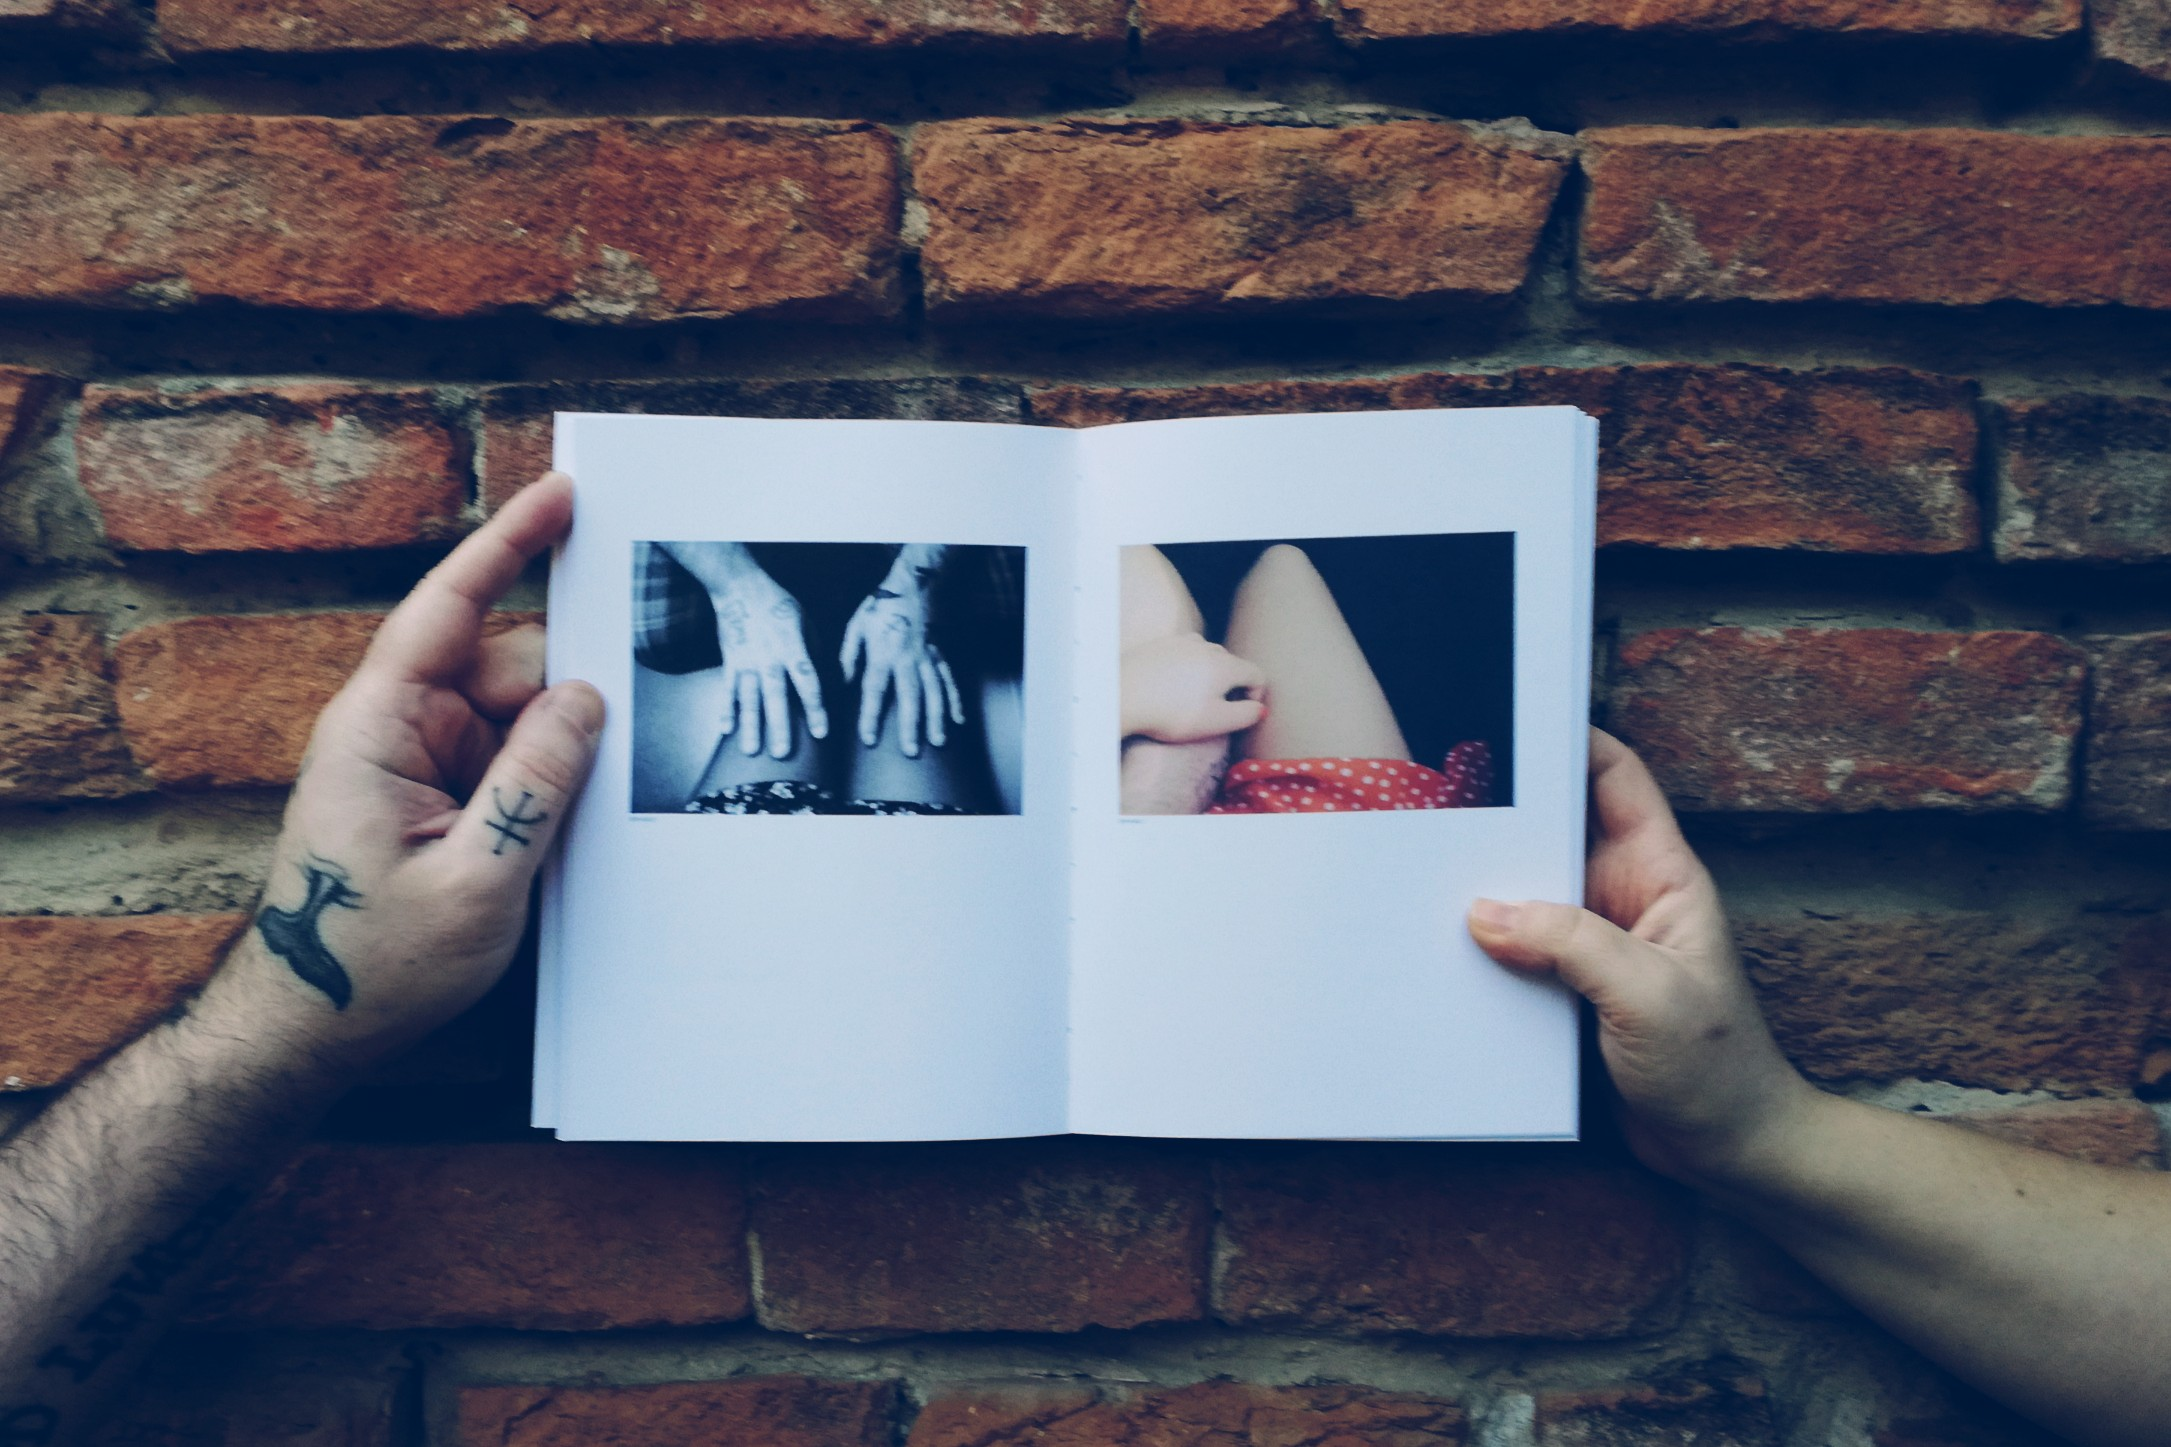 pubblicazione | fotografia | libro | Instagram | insta grammar love | Lannoo publishers | love | rhamely | william Dollace